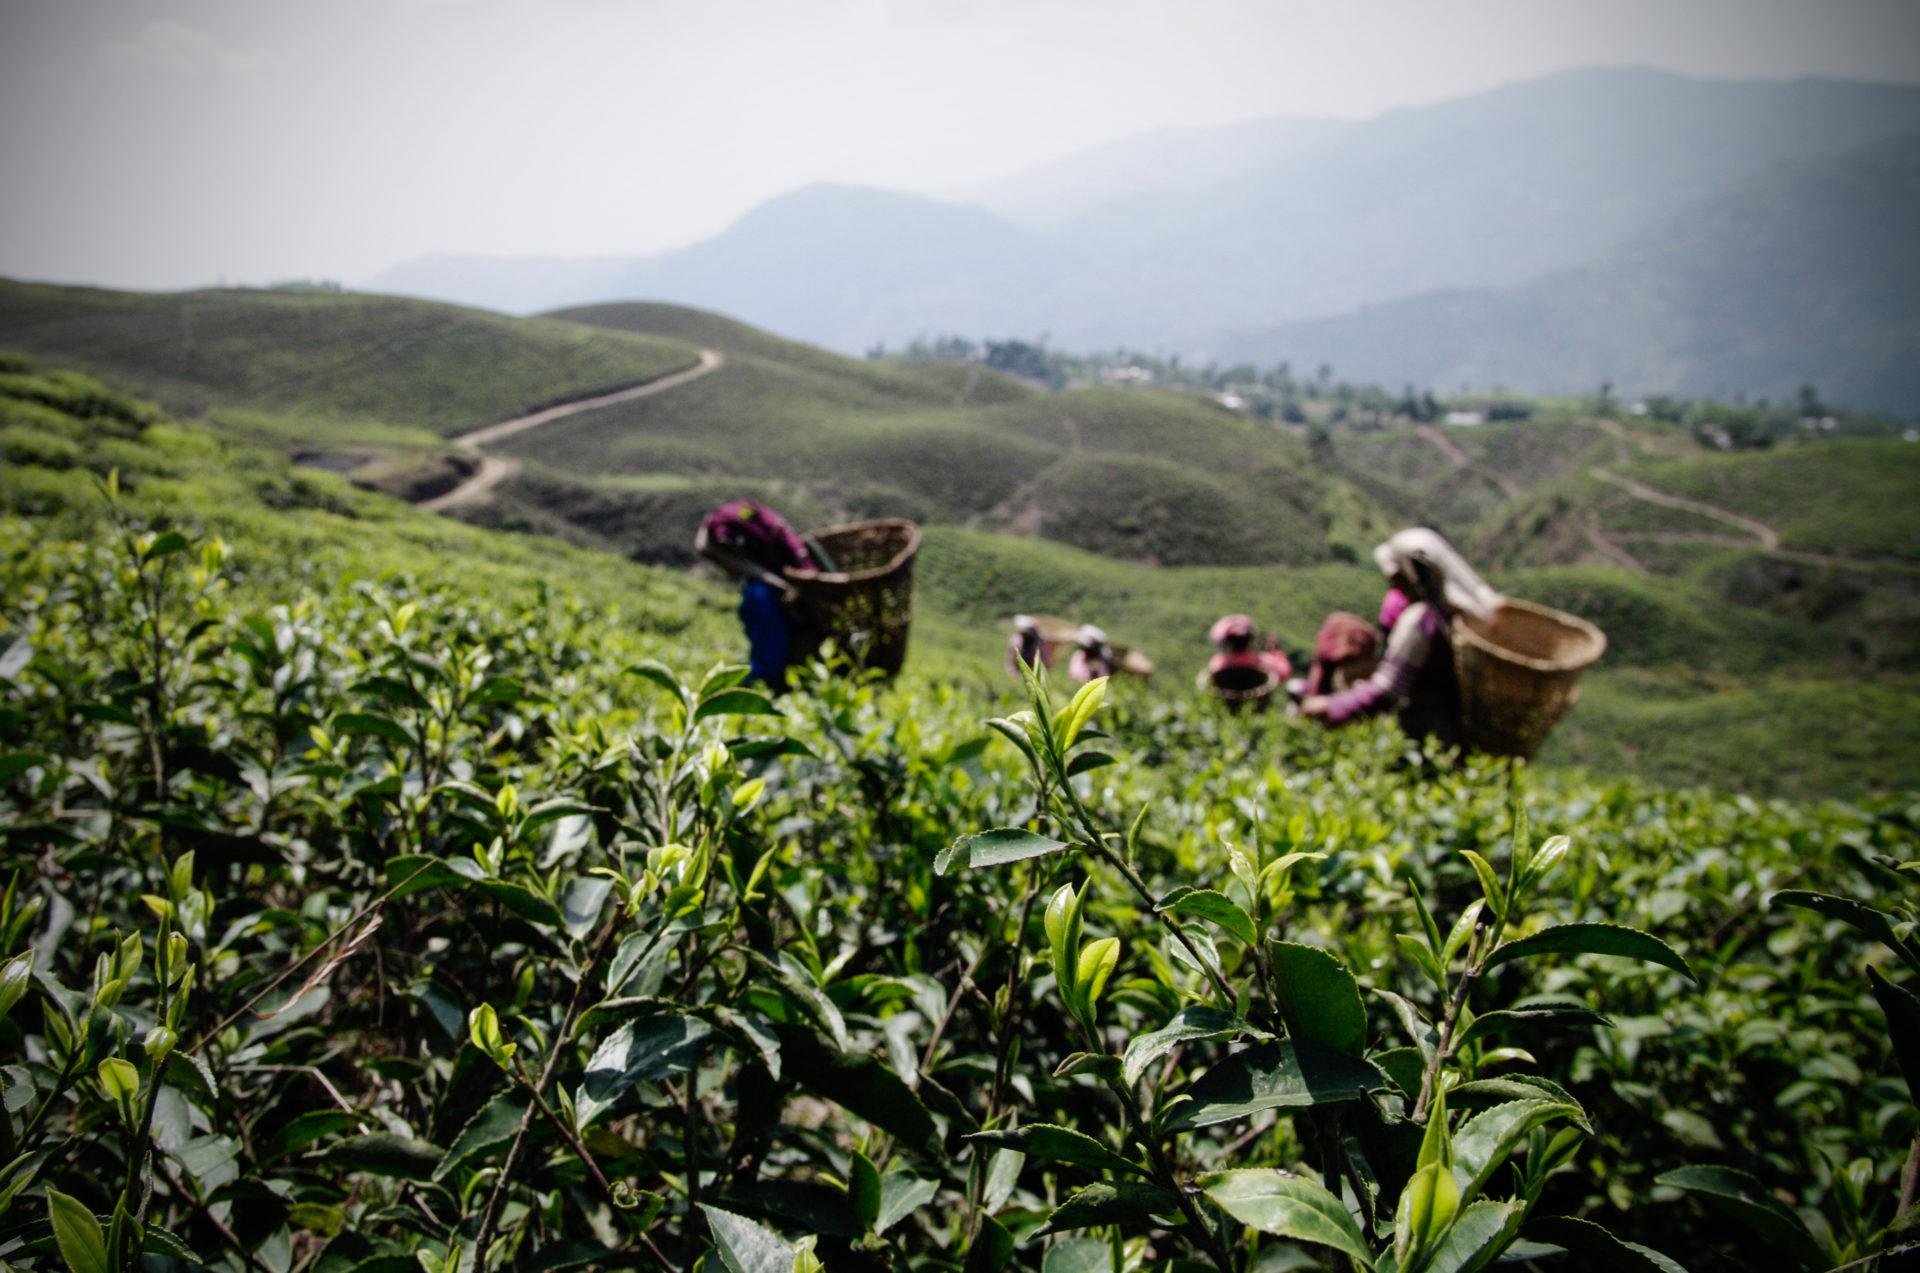 GIZ_Nepal_Organic-Tea_Ilam_IGP6610_Carolin-Weinkopf